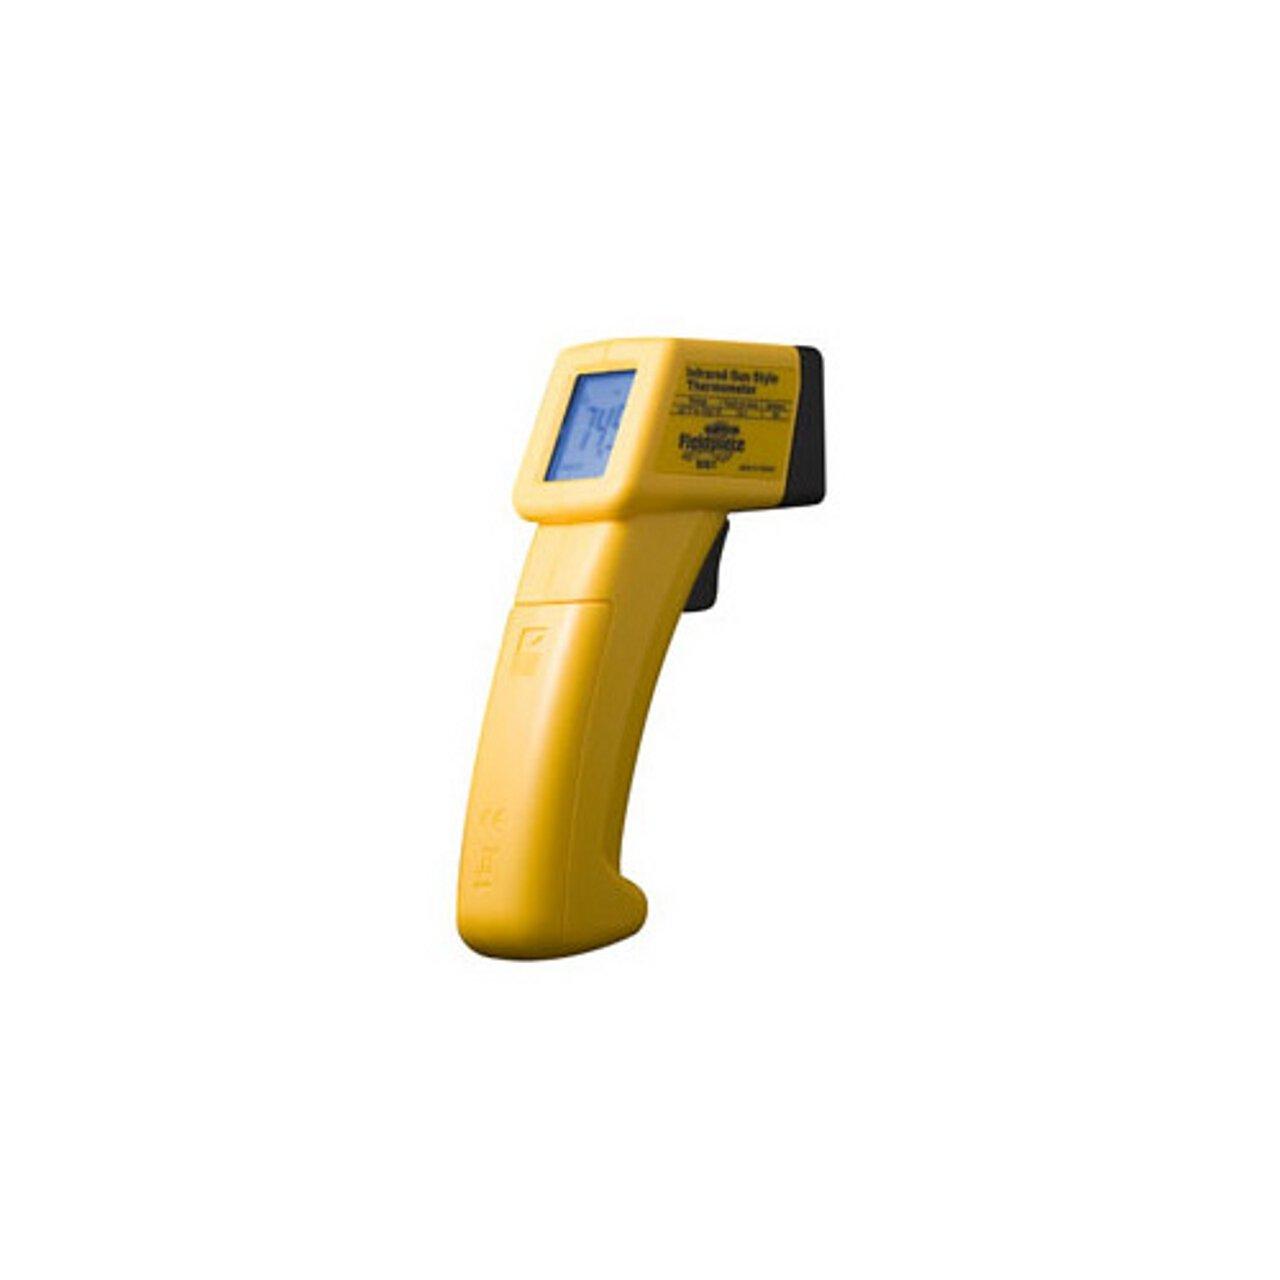 Fieldpiece SIG1 Gun-Style IR Thermometer (-22F to 1022F)